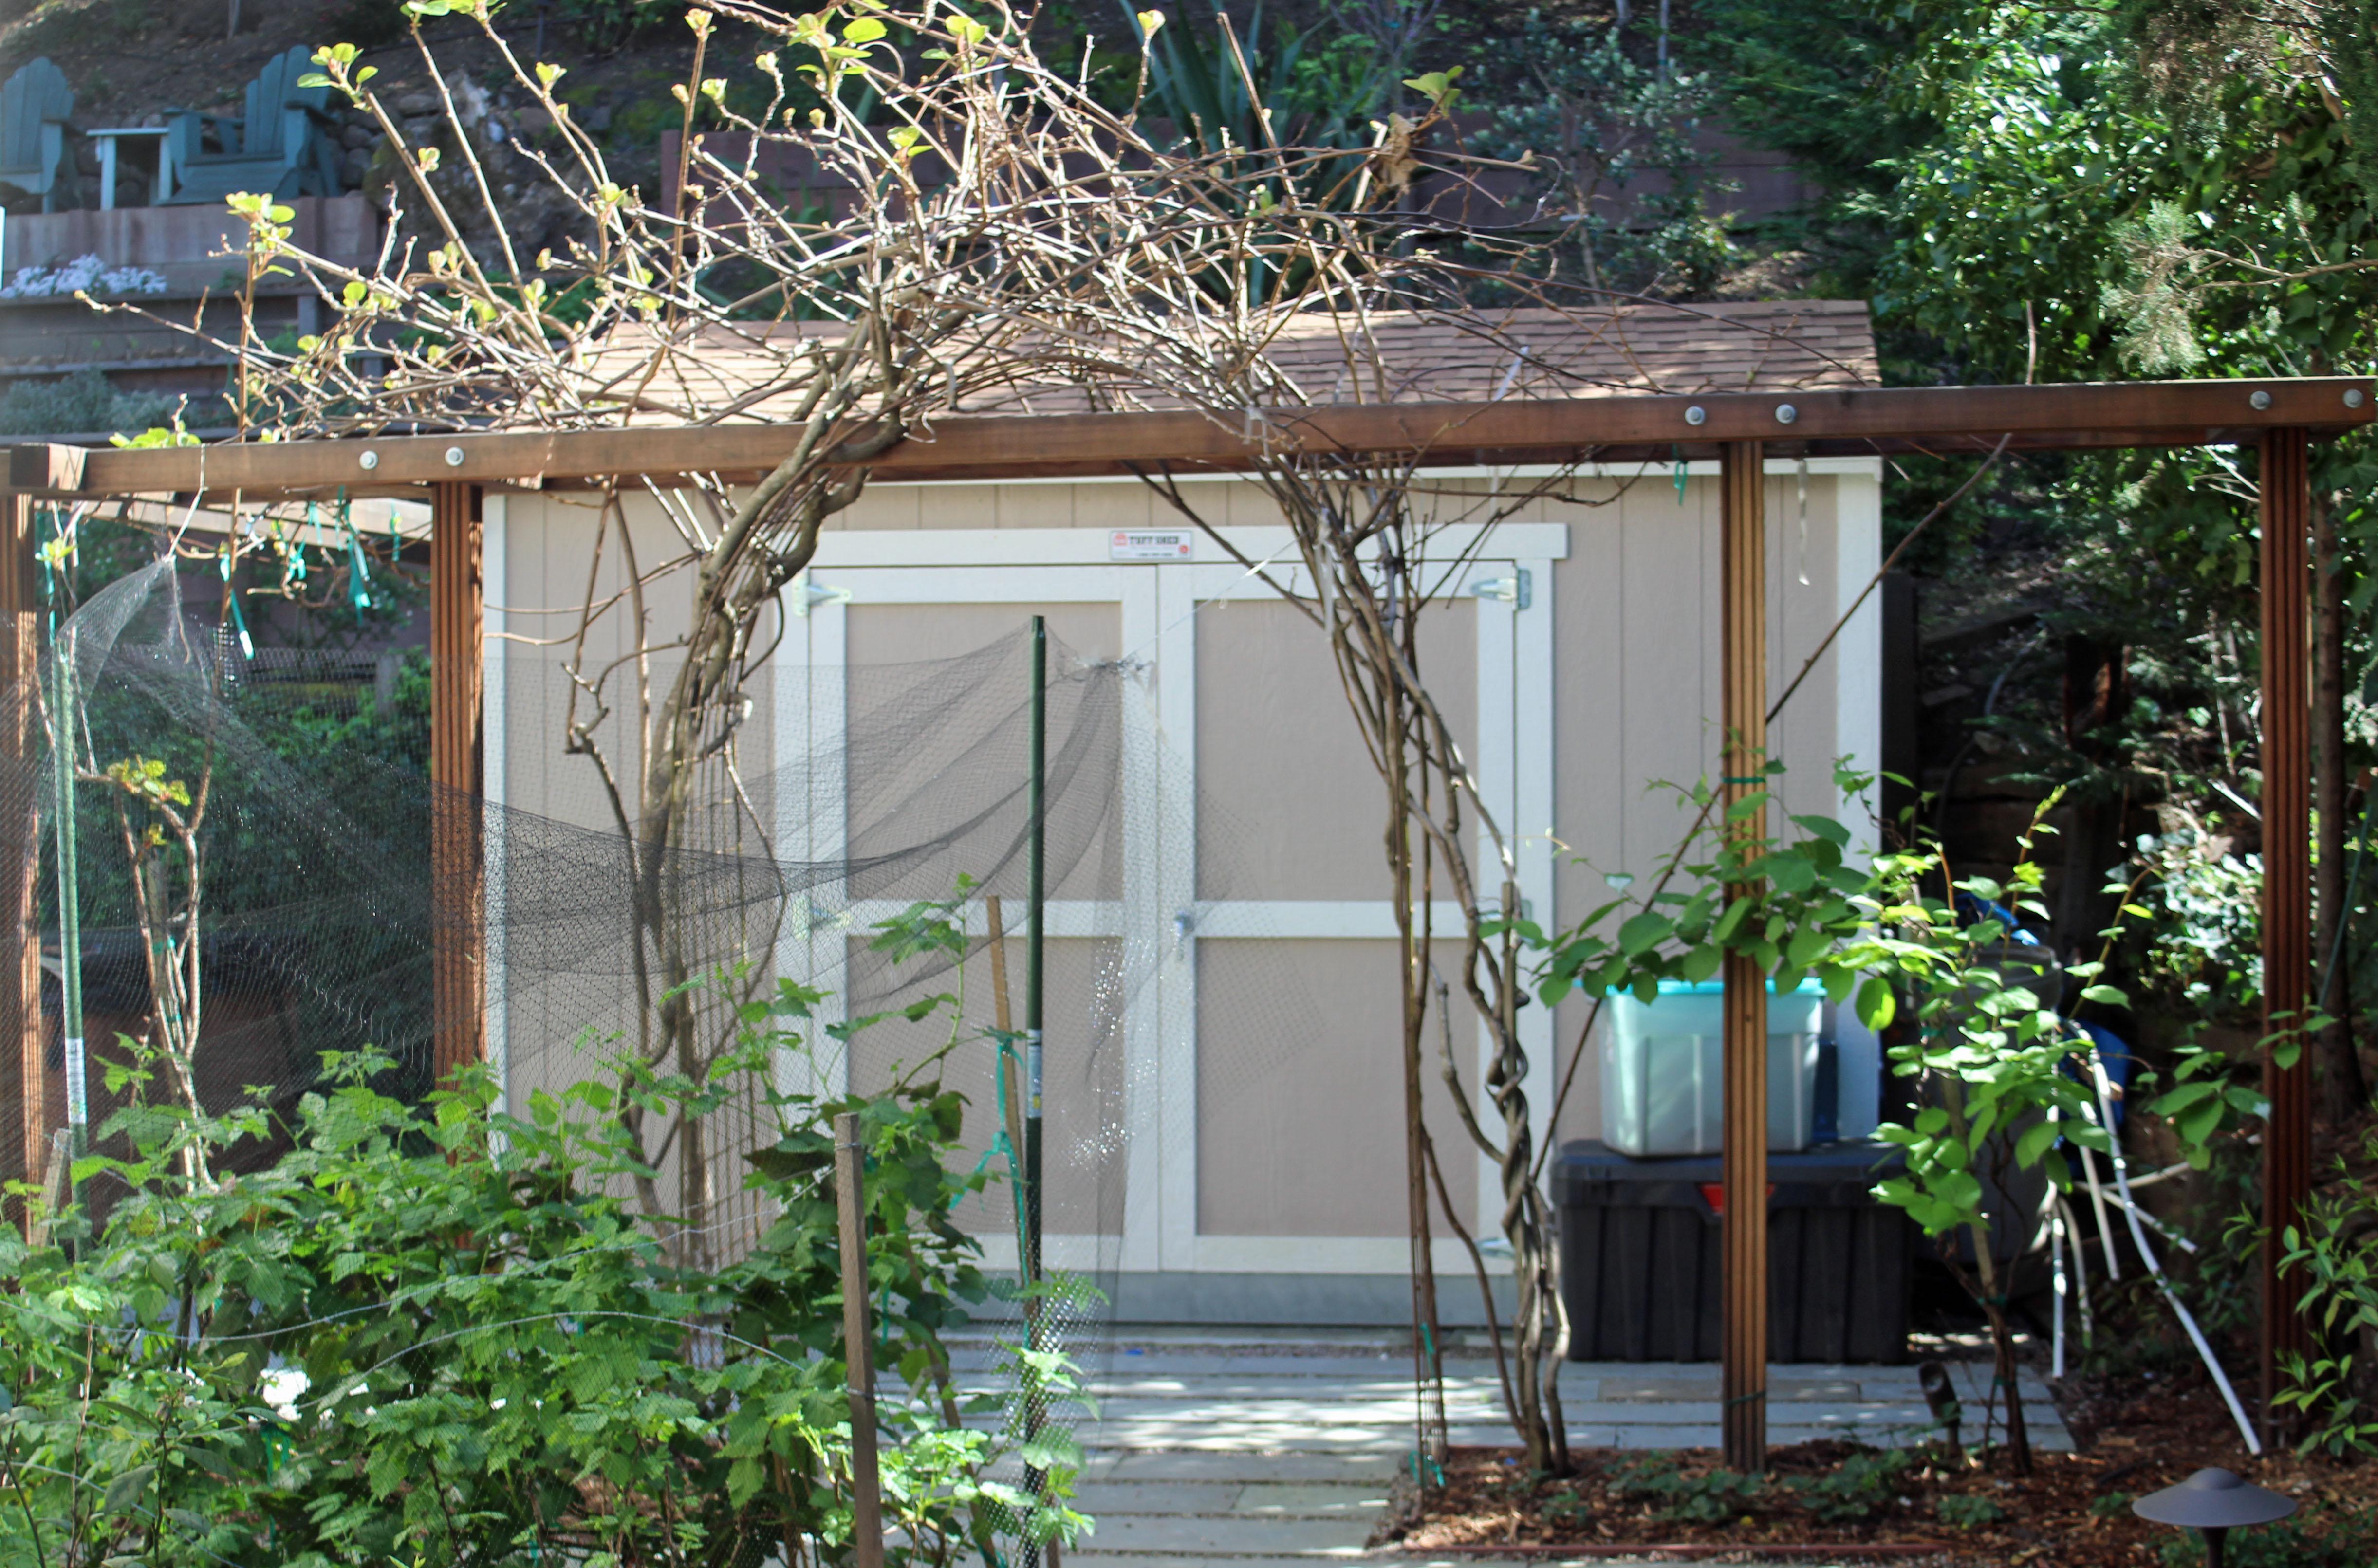 Backyard Kiwi Trellis and Shed